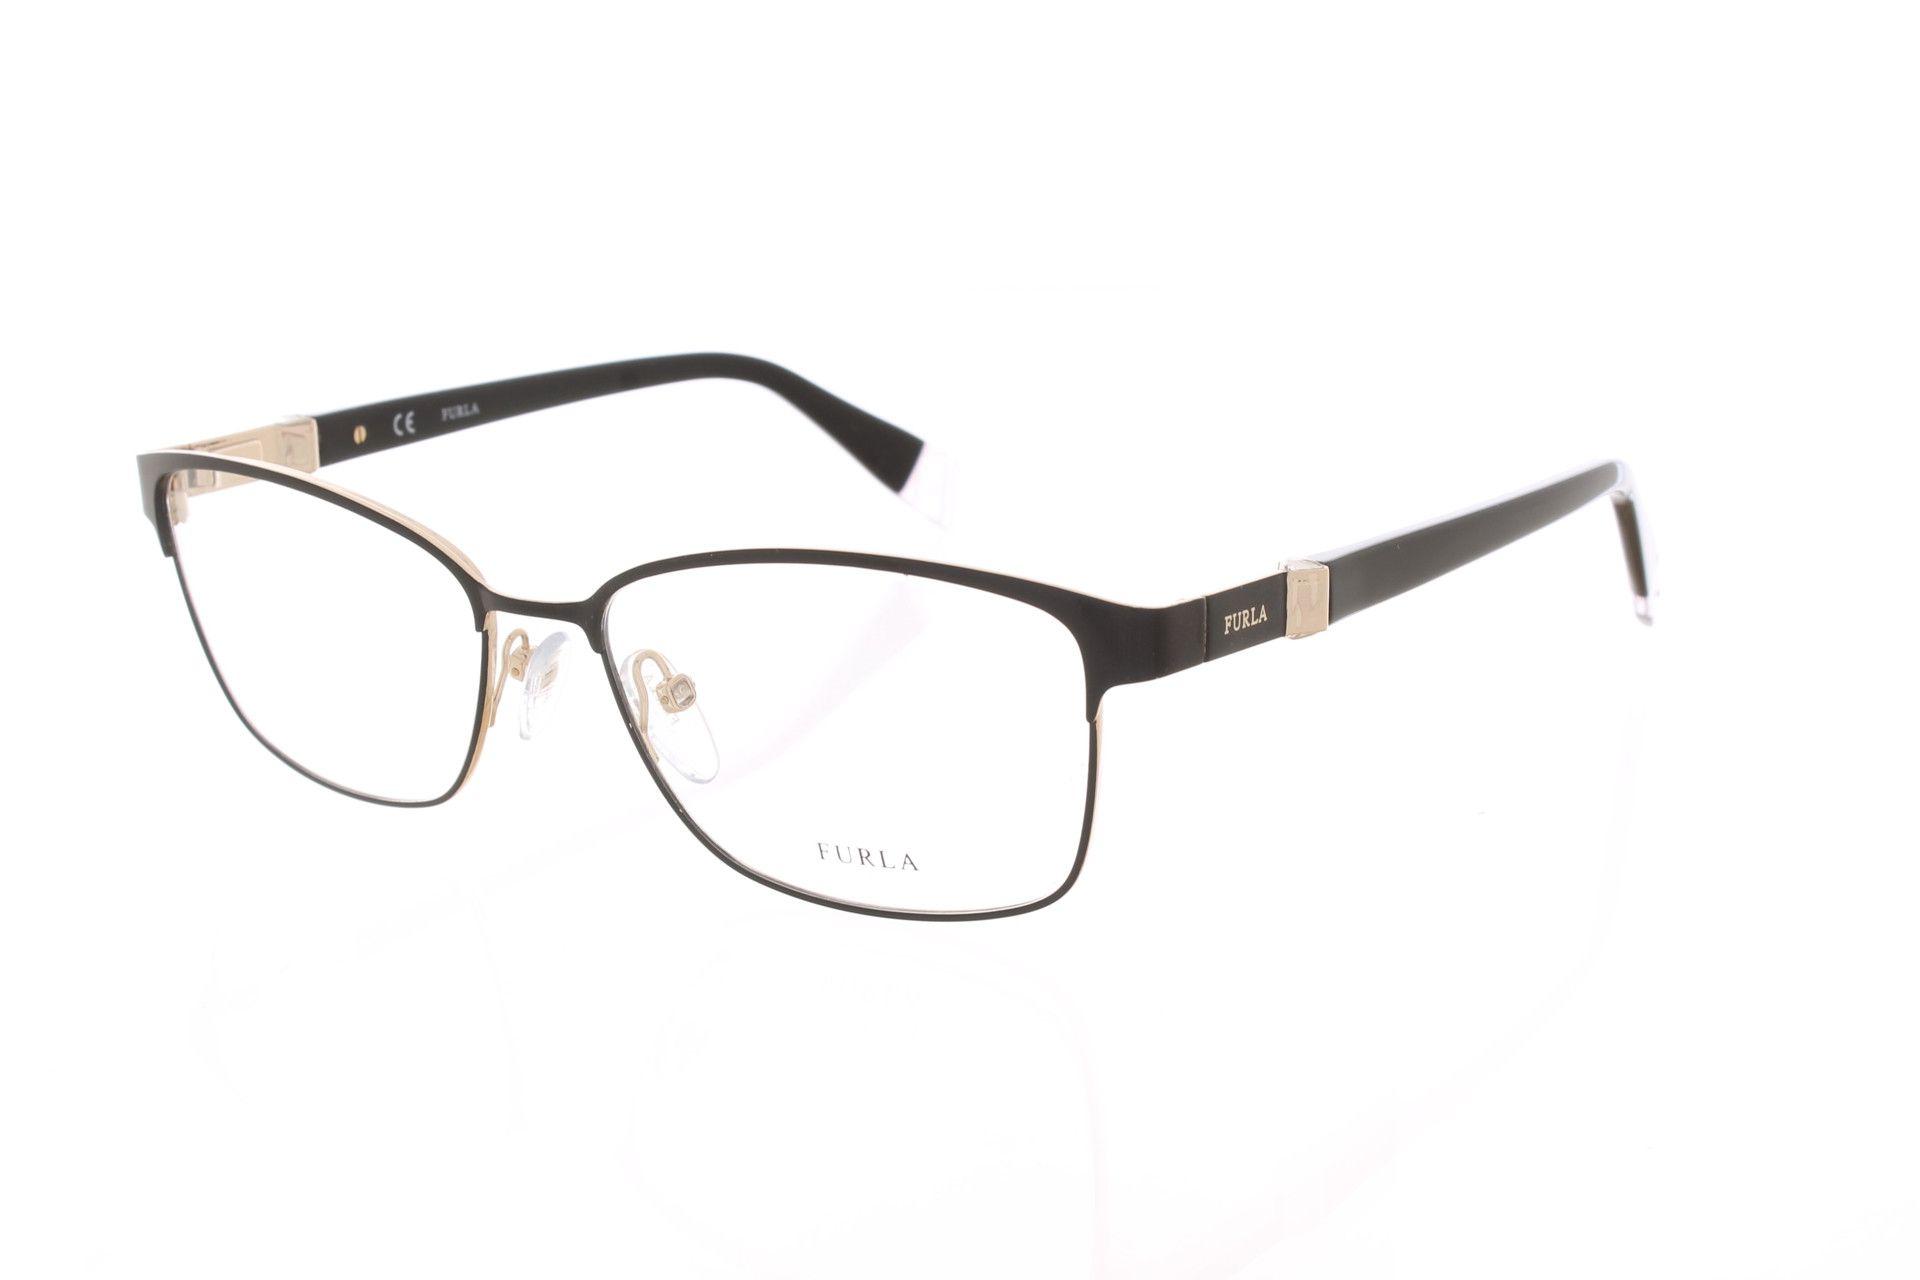 Furla szemüveg - VFU092S COL.0304 53-15-135 - Ár  45 768dc16d2b